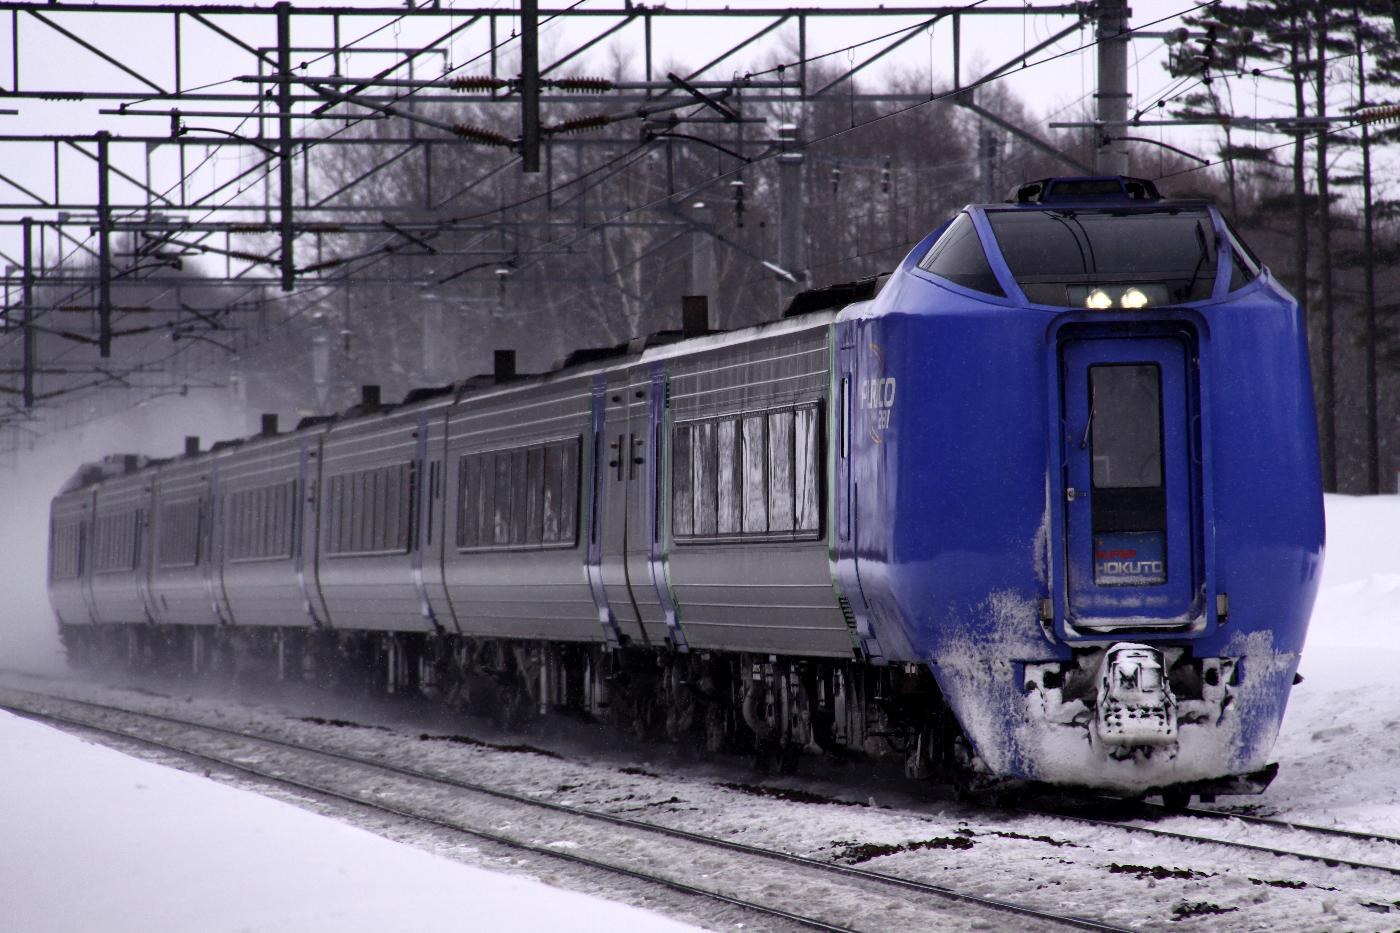 Jr1302163005